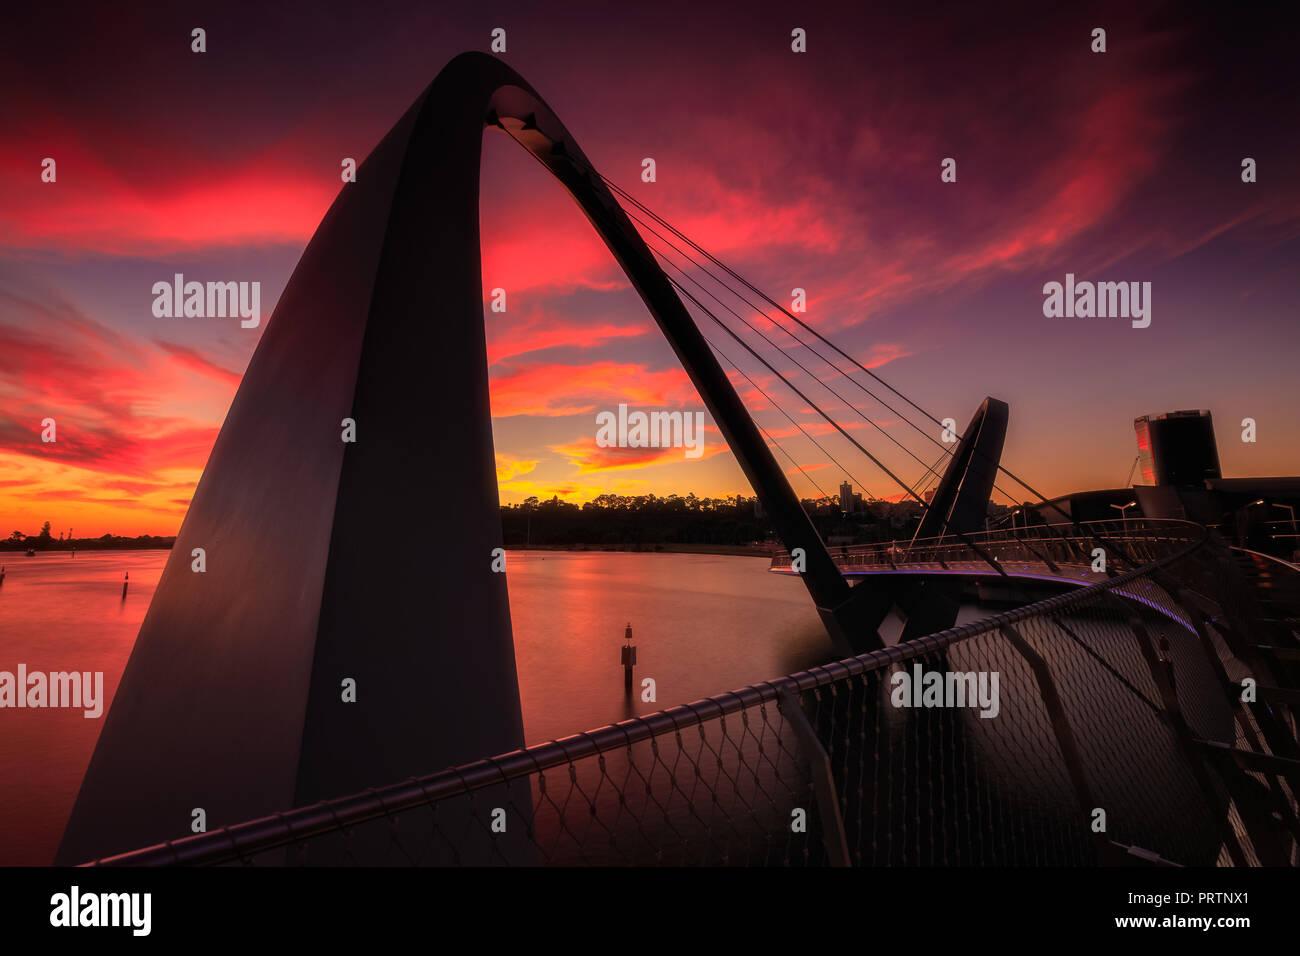 Elizabeth Quay, Perth Foreshore - Stock Image